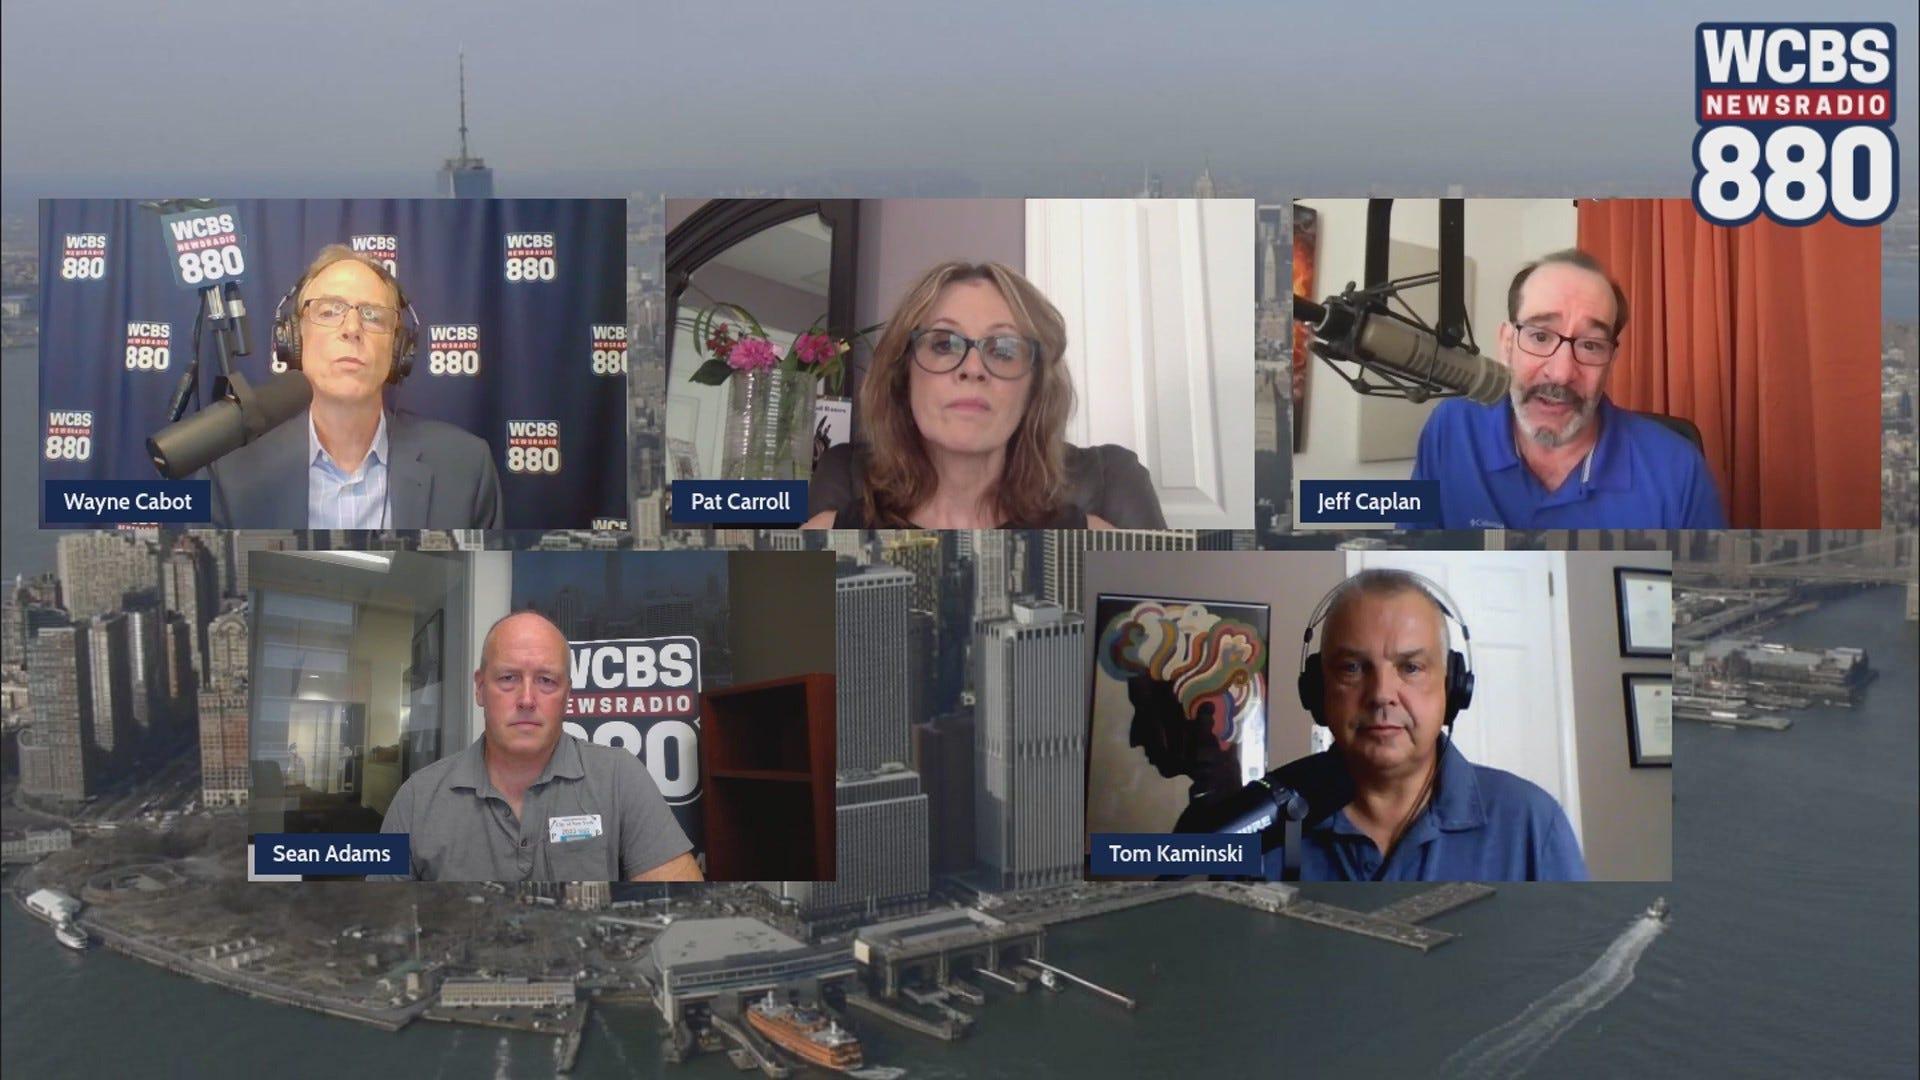 880 In Depth: WCBS remembers 9/11